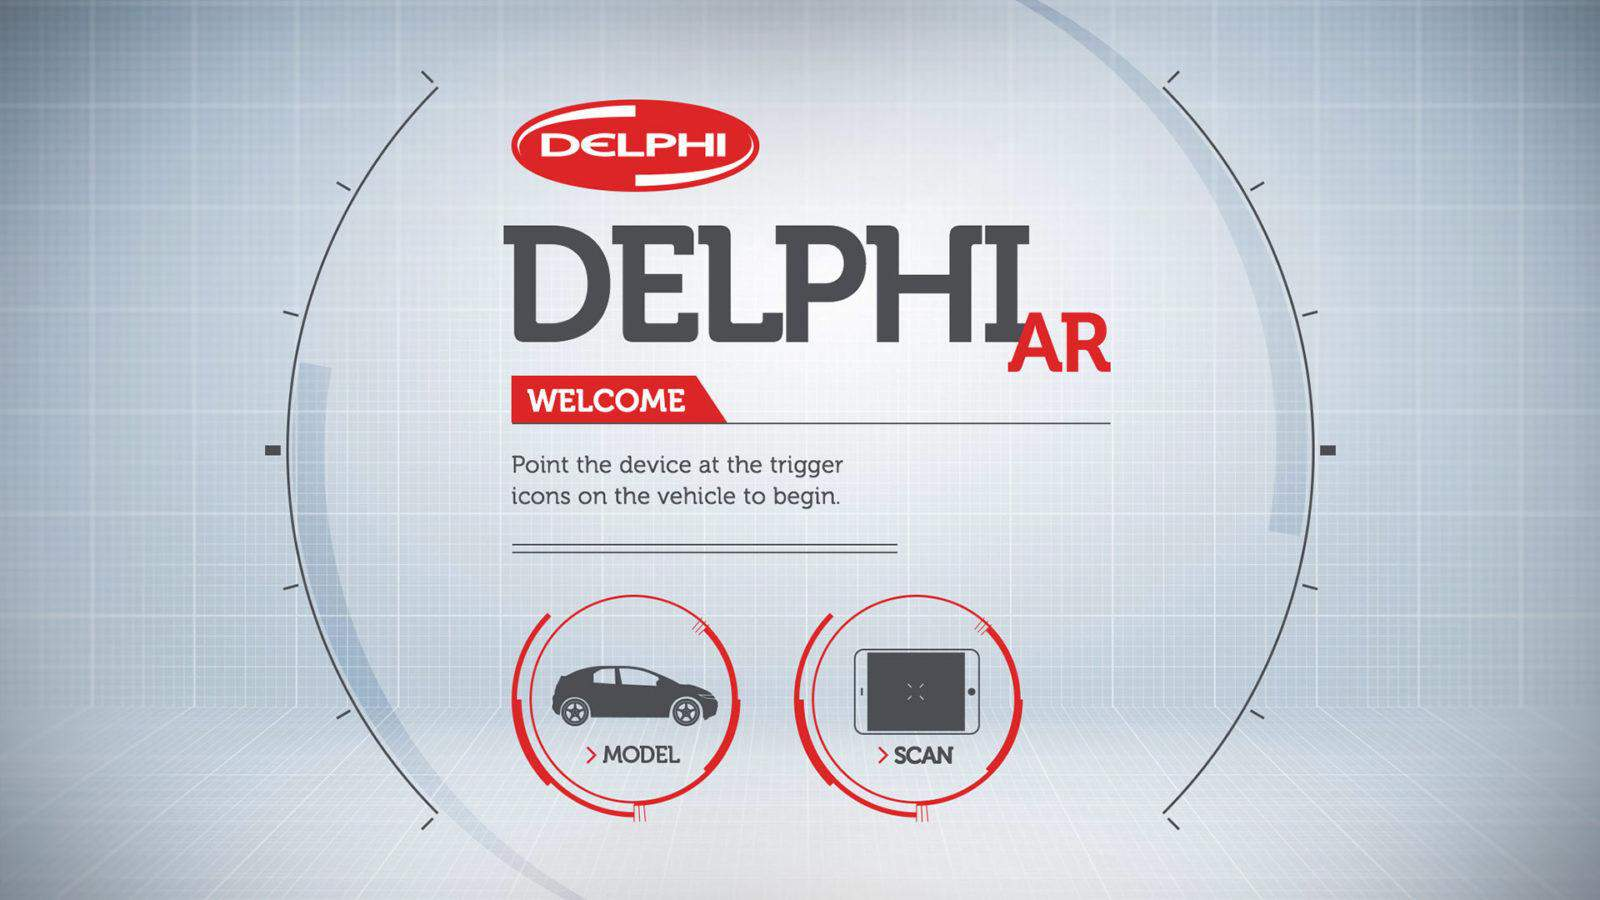 Delphi Augmented Reality app